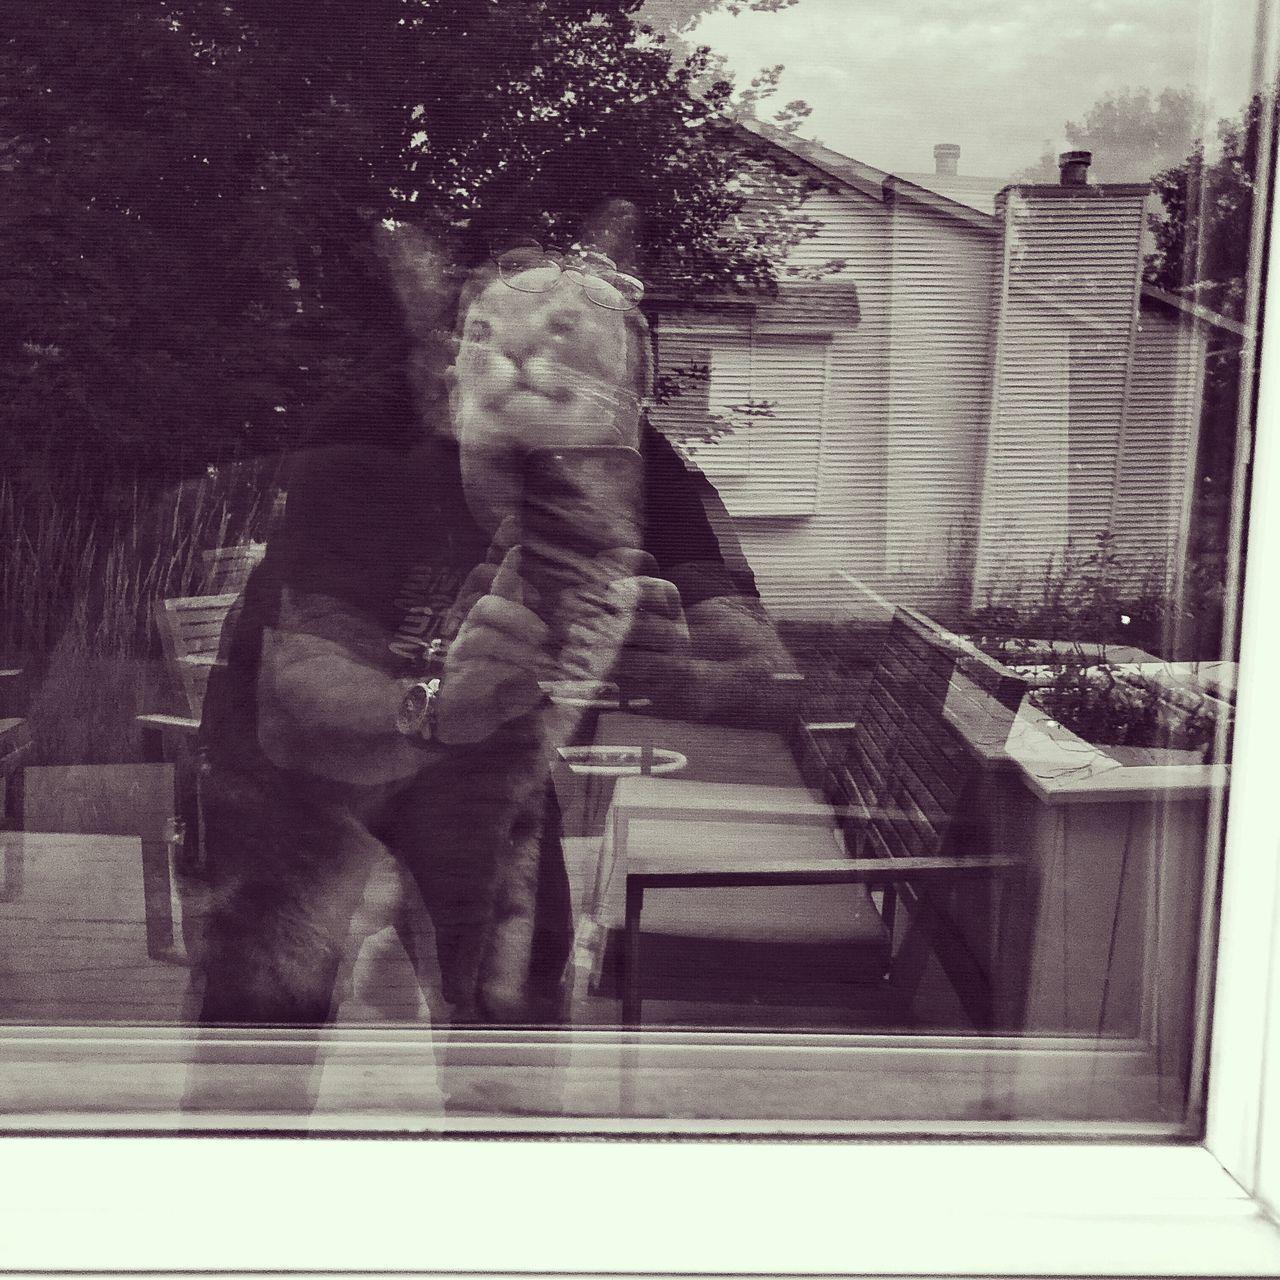 MAN HOLDING GLASS WINDOW